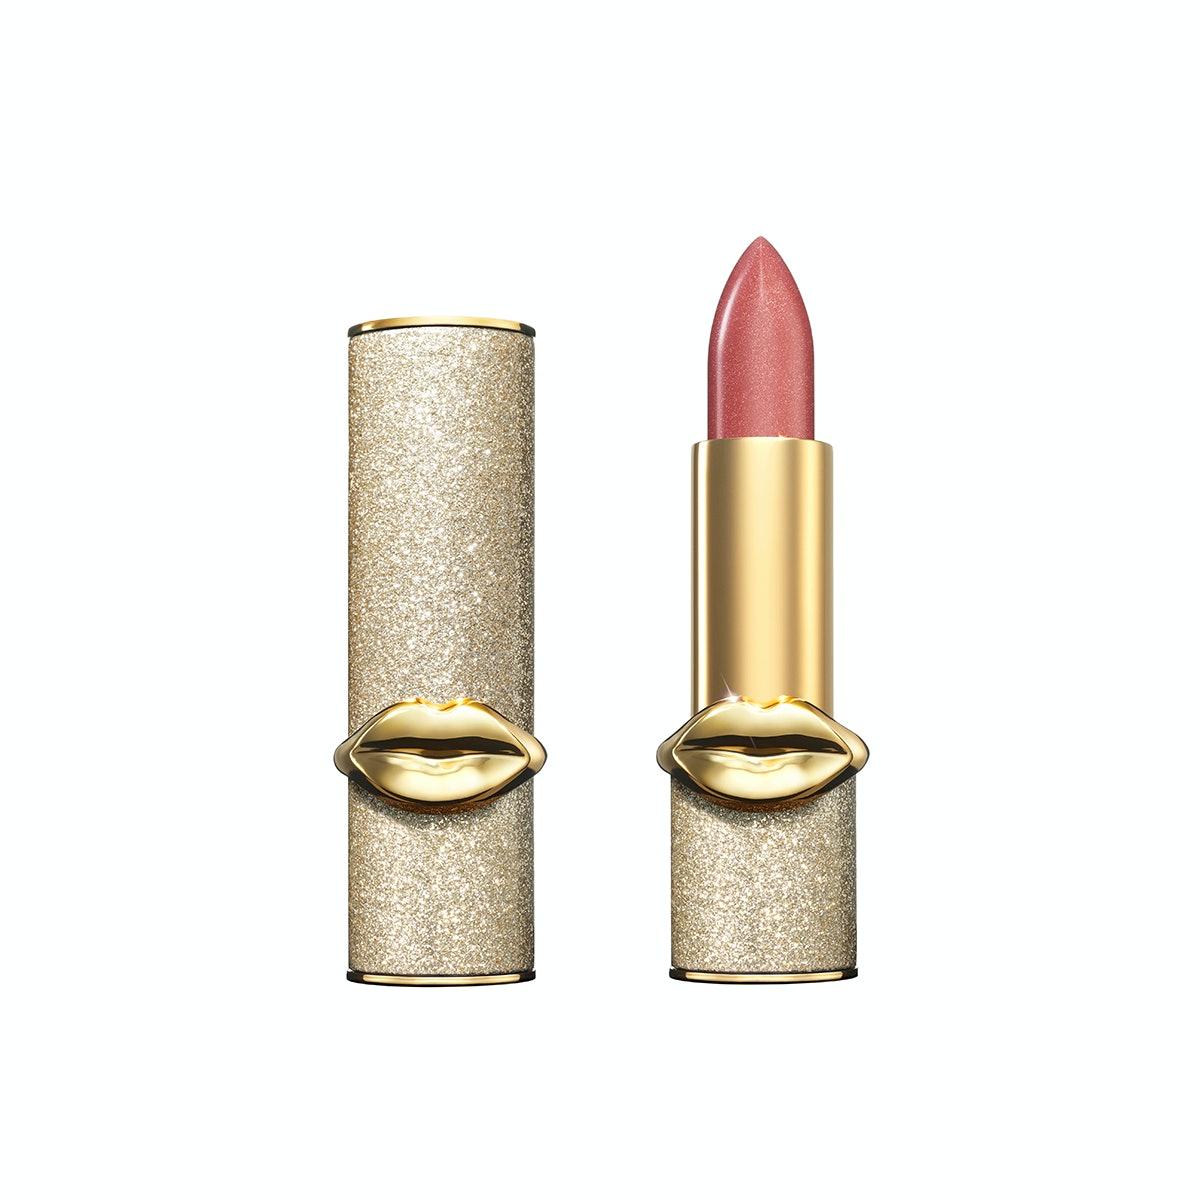 BLITZTRANCE™ Lipstick in Naked Kiss